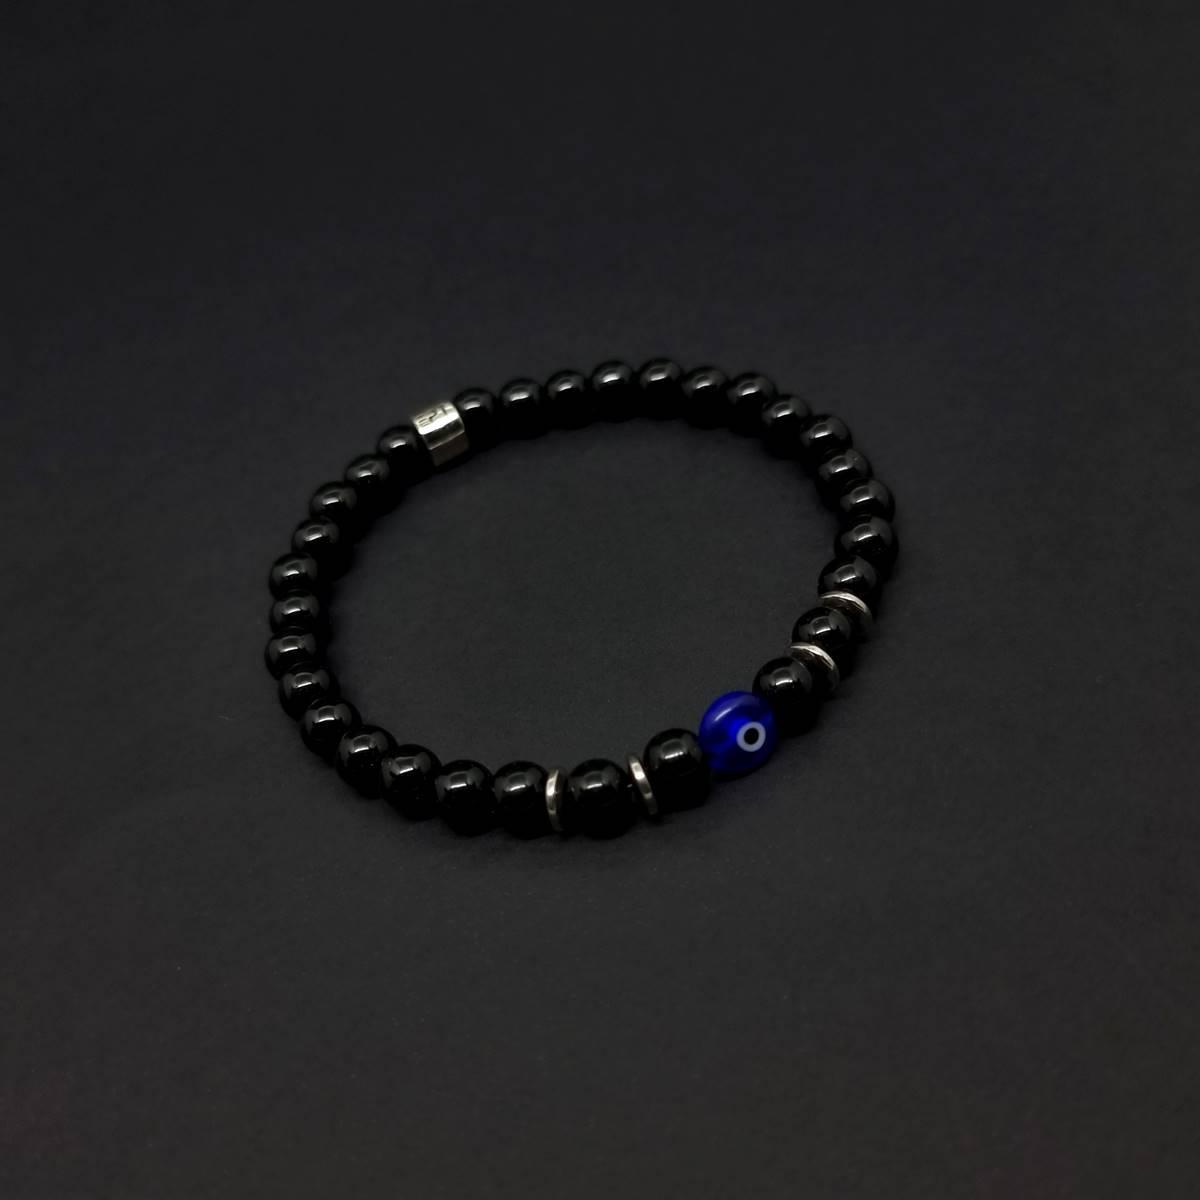 Pulseira de Pedras Onix Olho Grego Azul